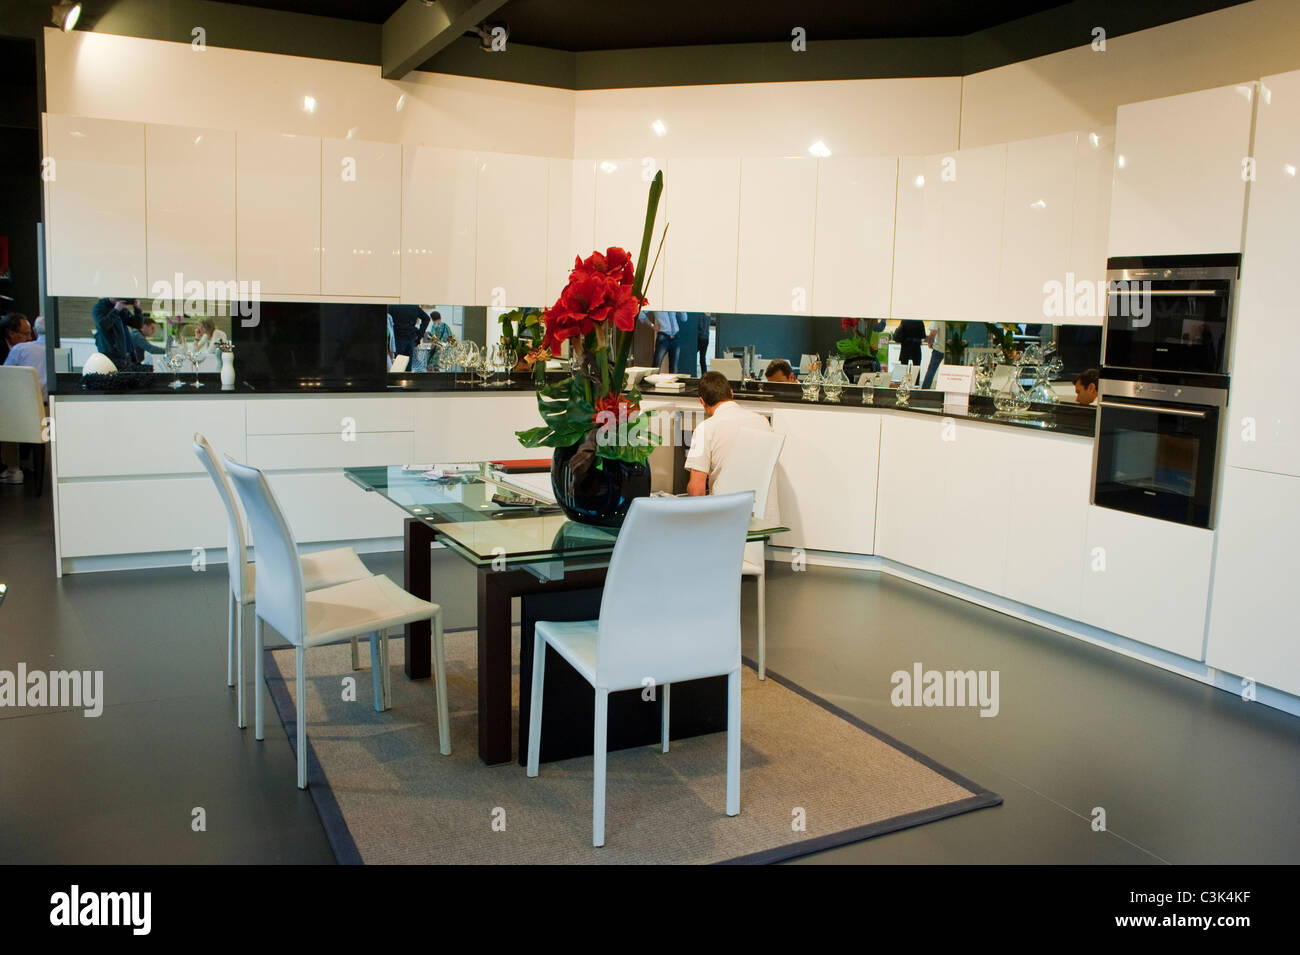 Parigi, Francia, contemporanea cucina interna a Trade Show, cucine ...